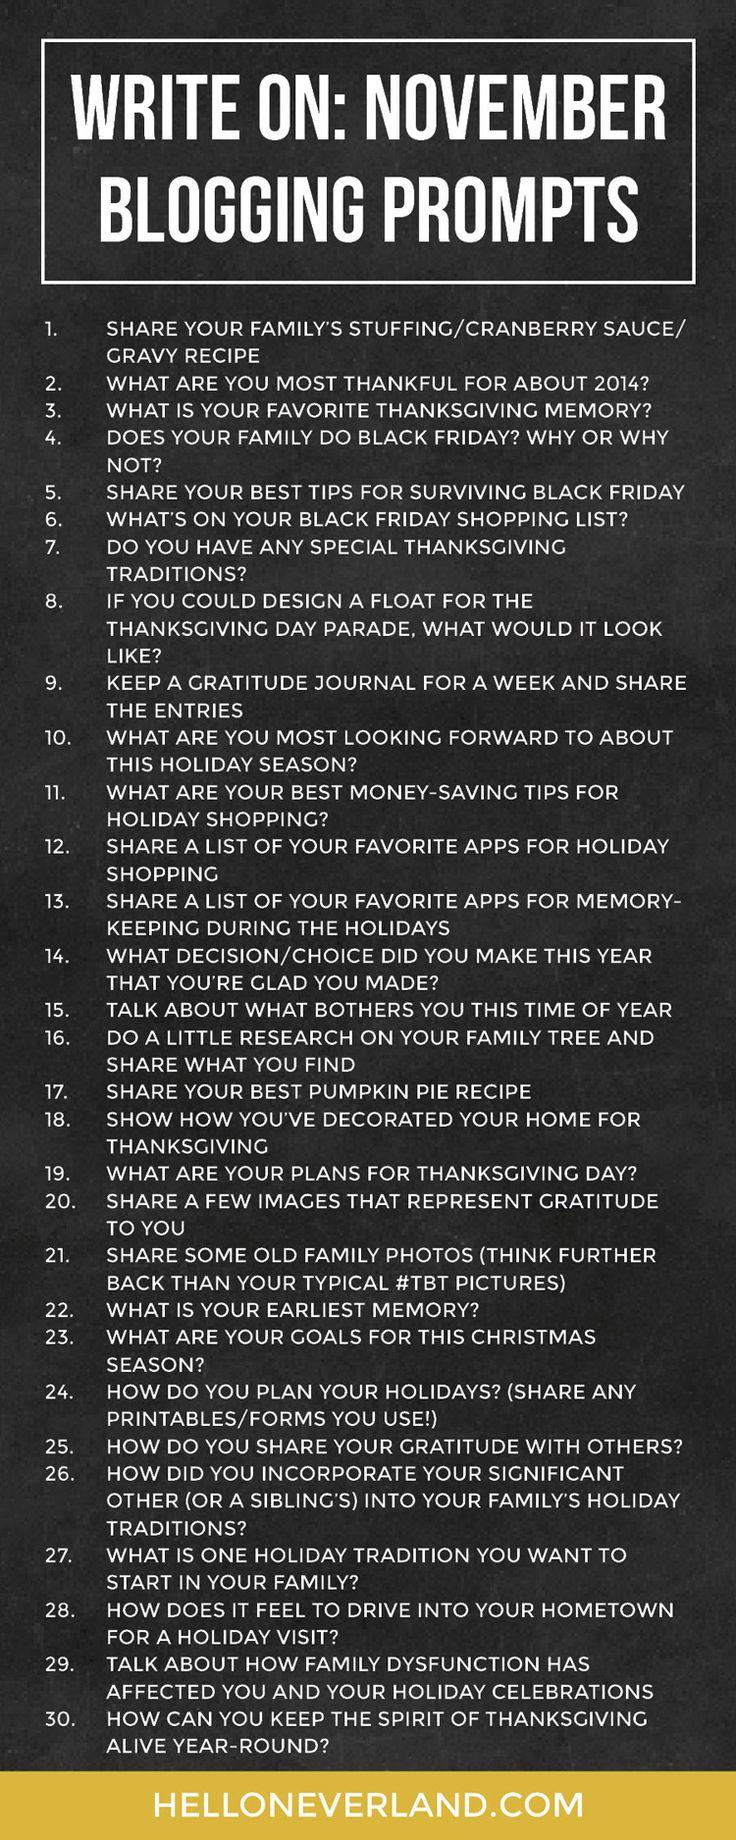 Write on: November blogging prompts | Hello Neverland